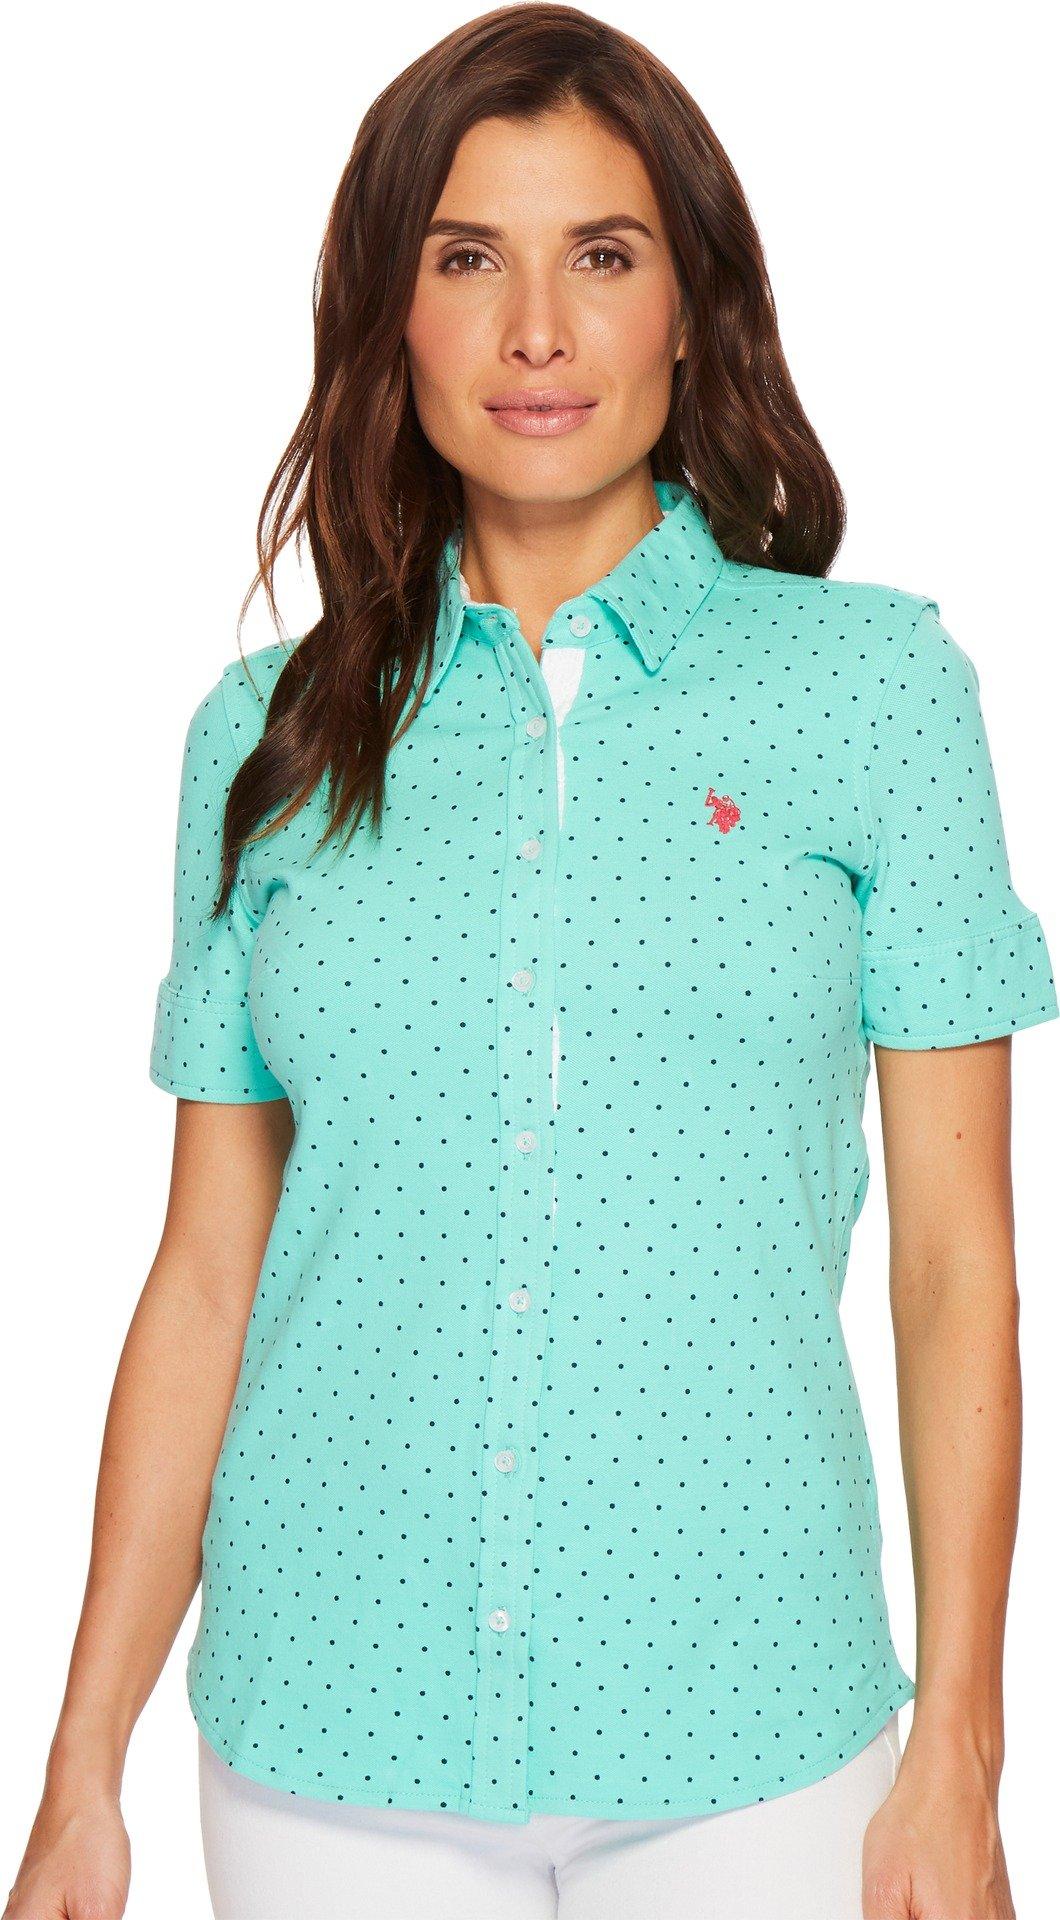 U.S. Polo Assn. Women's Short Sleeve Fashion Blouse, Cool Breeze-Pique Dots-Fhbd, L